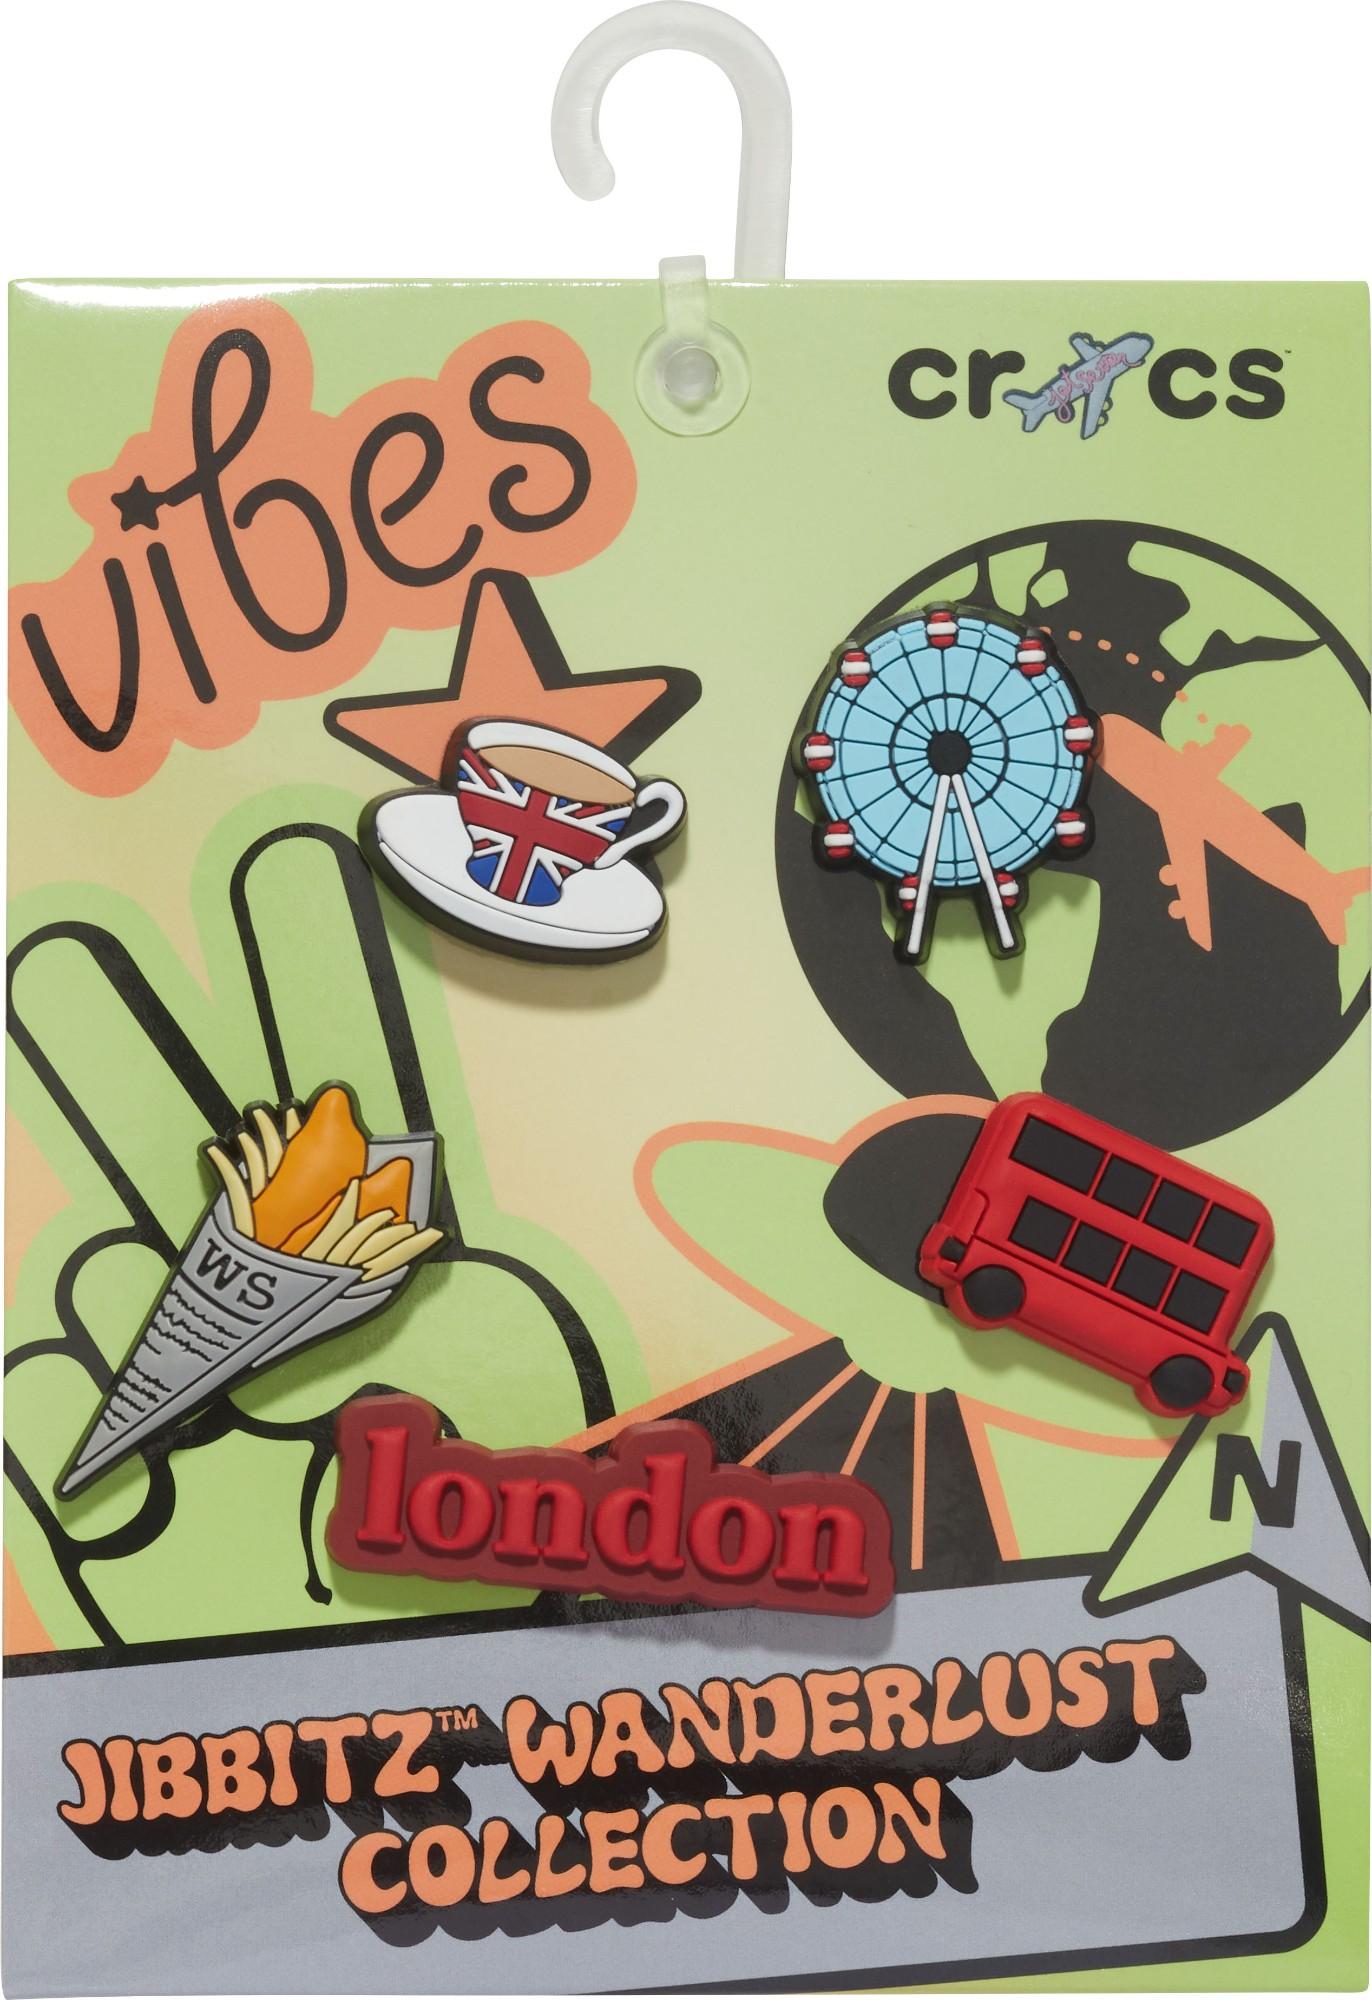 Crocs™ Crocs LONDON CITY WONDERLUST 5-PACK G0783200-MU